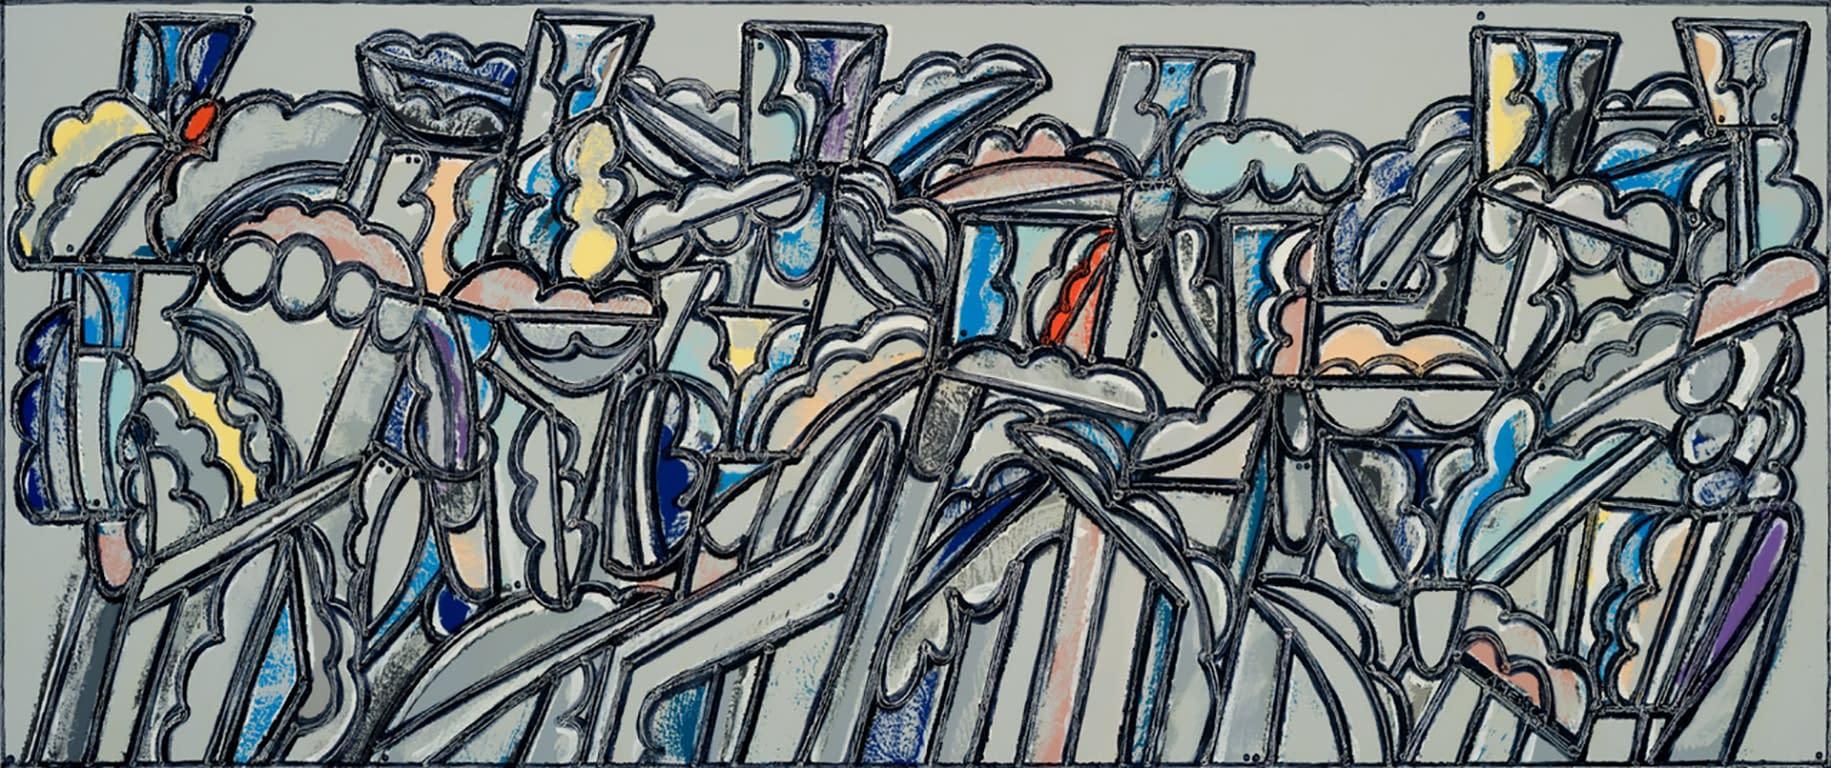 Irises_America_Martin_Oil_Acrylic_on_Canvas_40_x_96